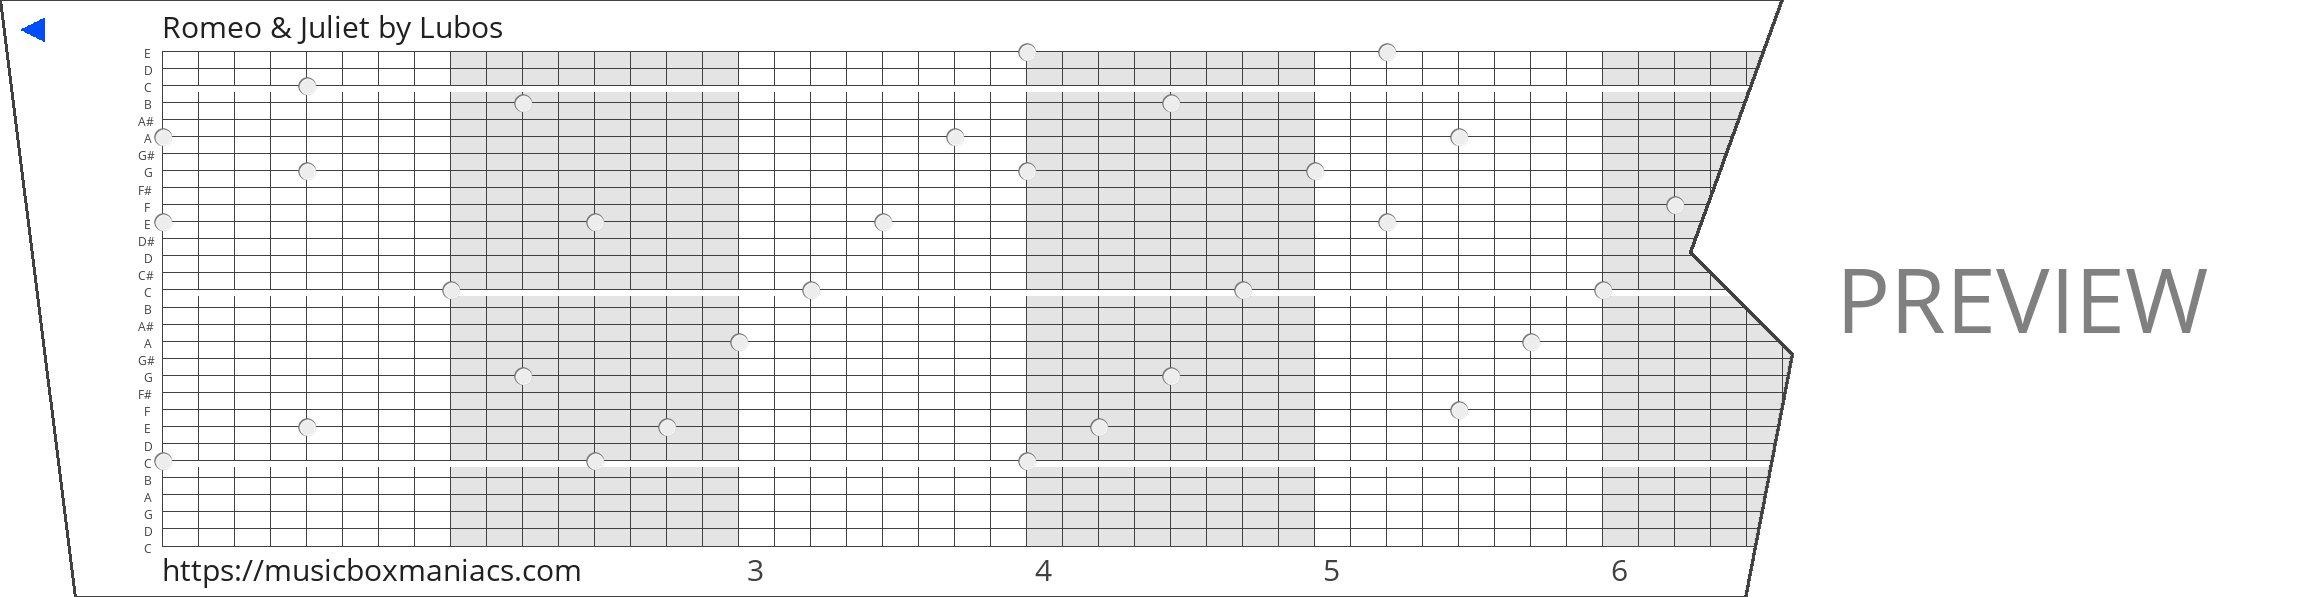 Romeo & Juliet 30 note music box paper strip